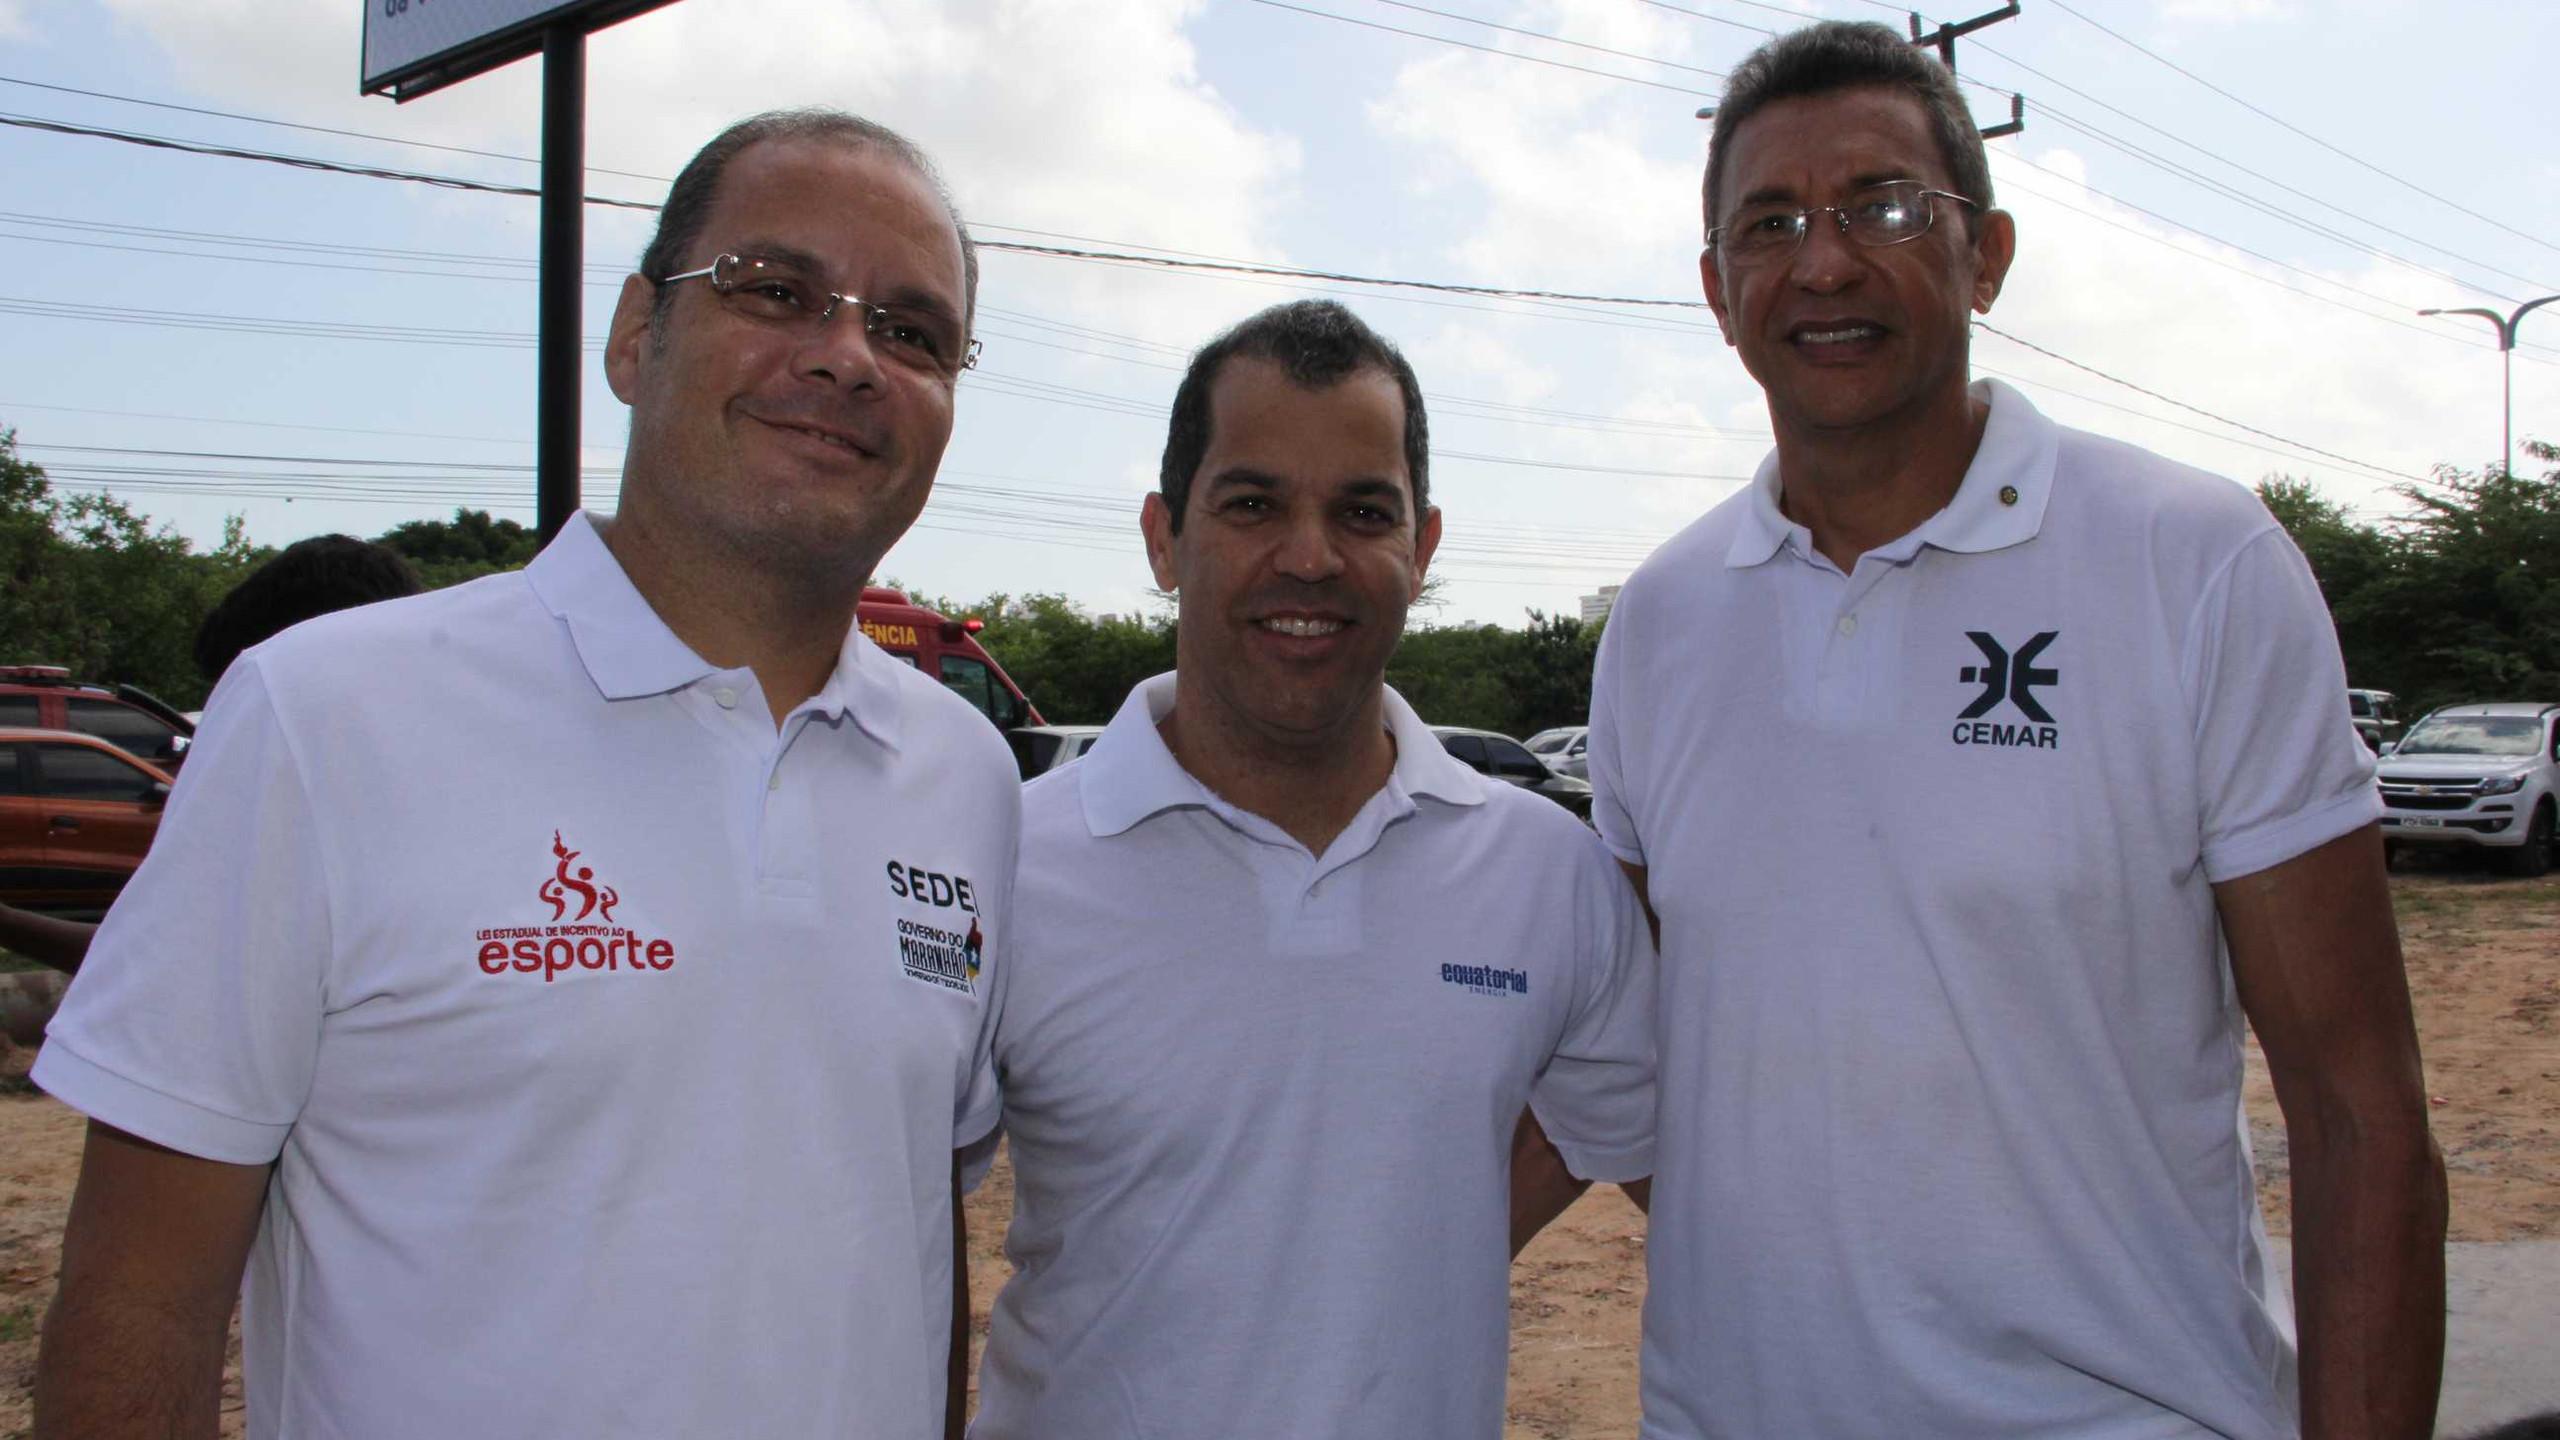 O Sec. de Esportes Rogério Cafeteira com Carlos Hubert e Luis Carlos Cardoso (Cemar)